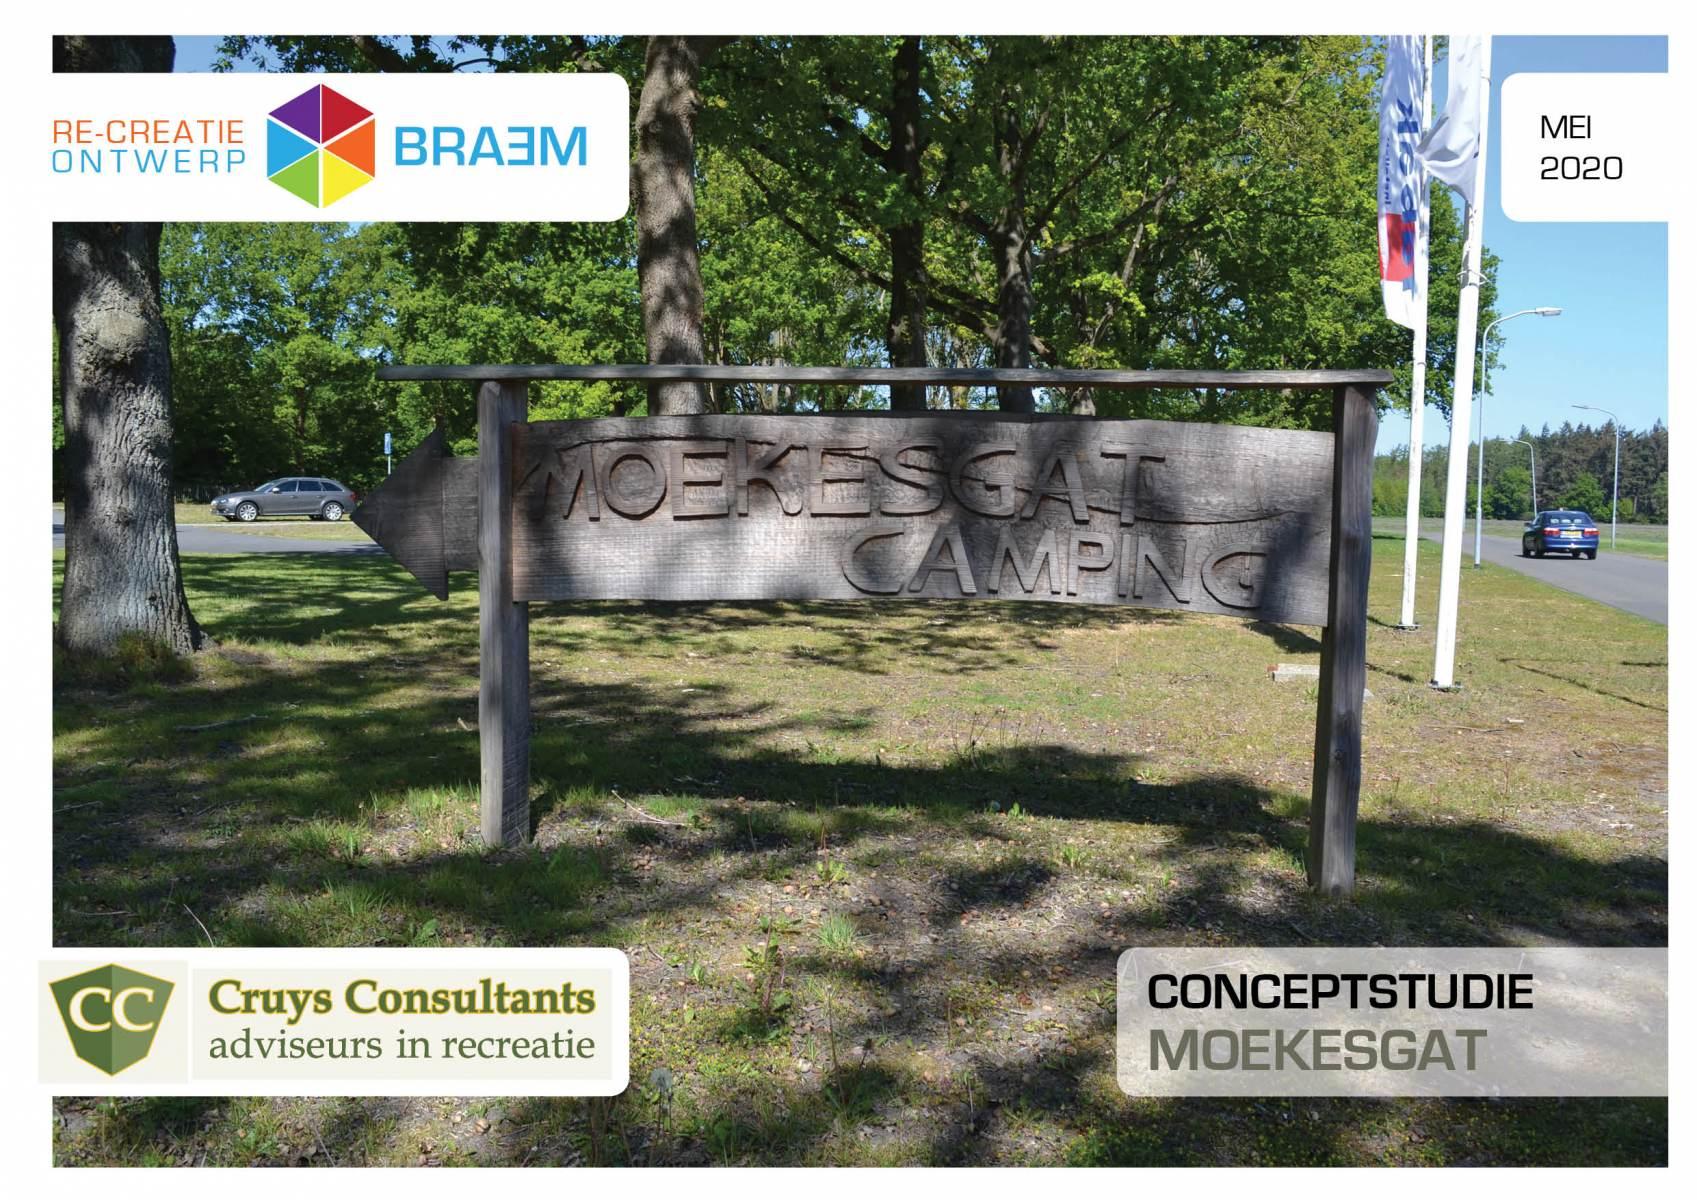 Moekesgat-Conceptstudie